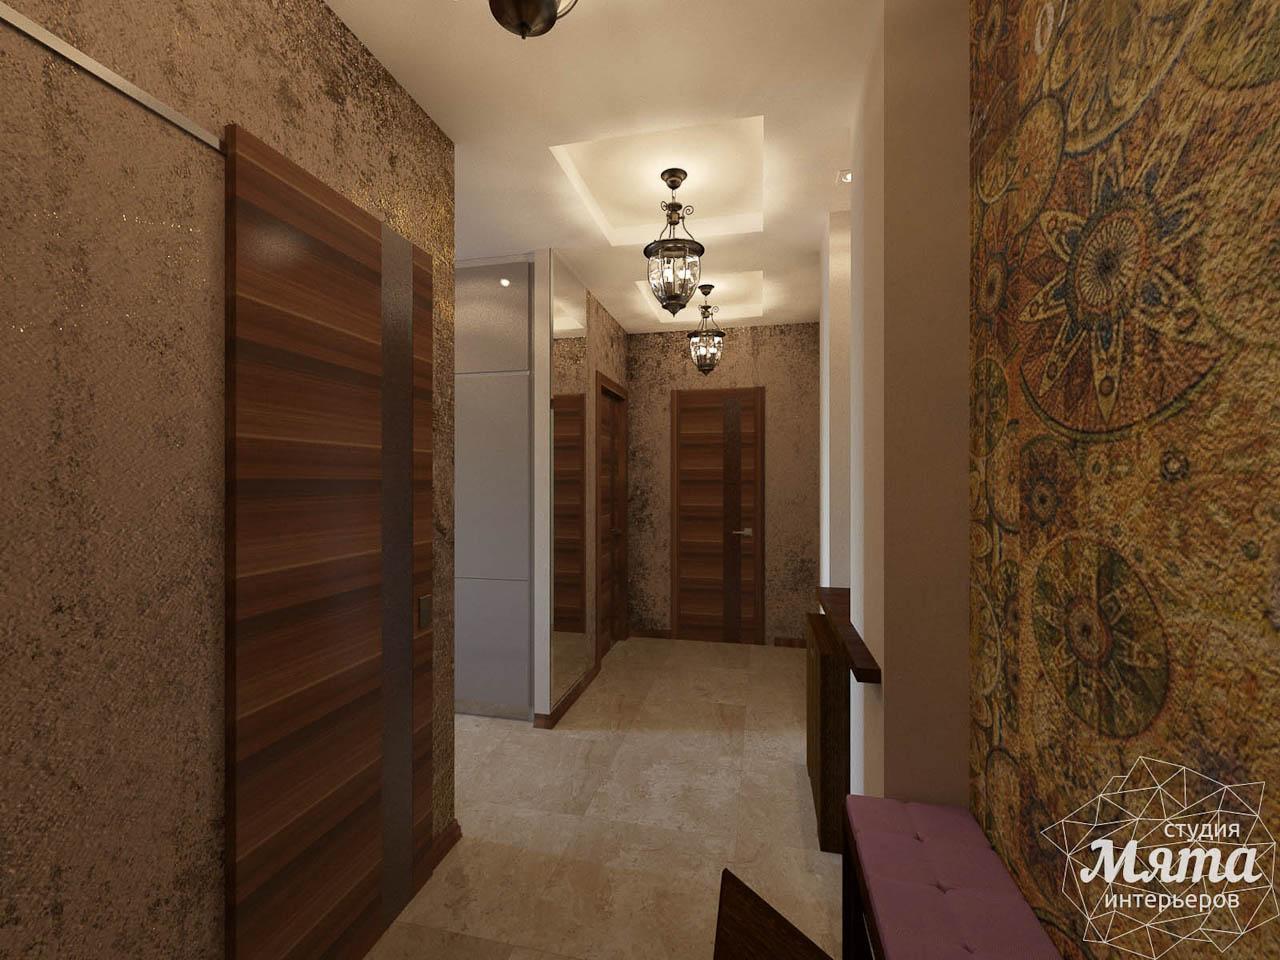 Дизайн интерьера трехкомнатной квартиры по ул. Мельникова 27 img69704311